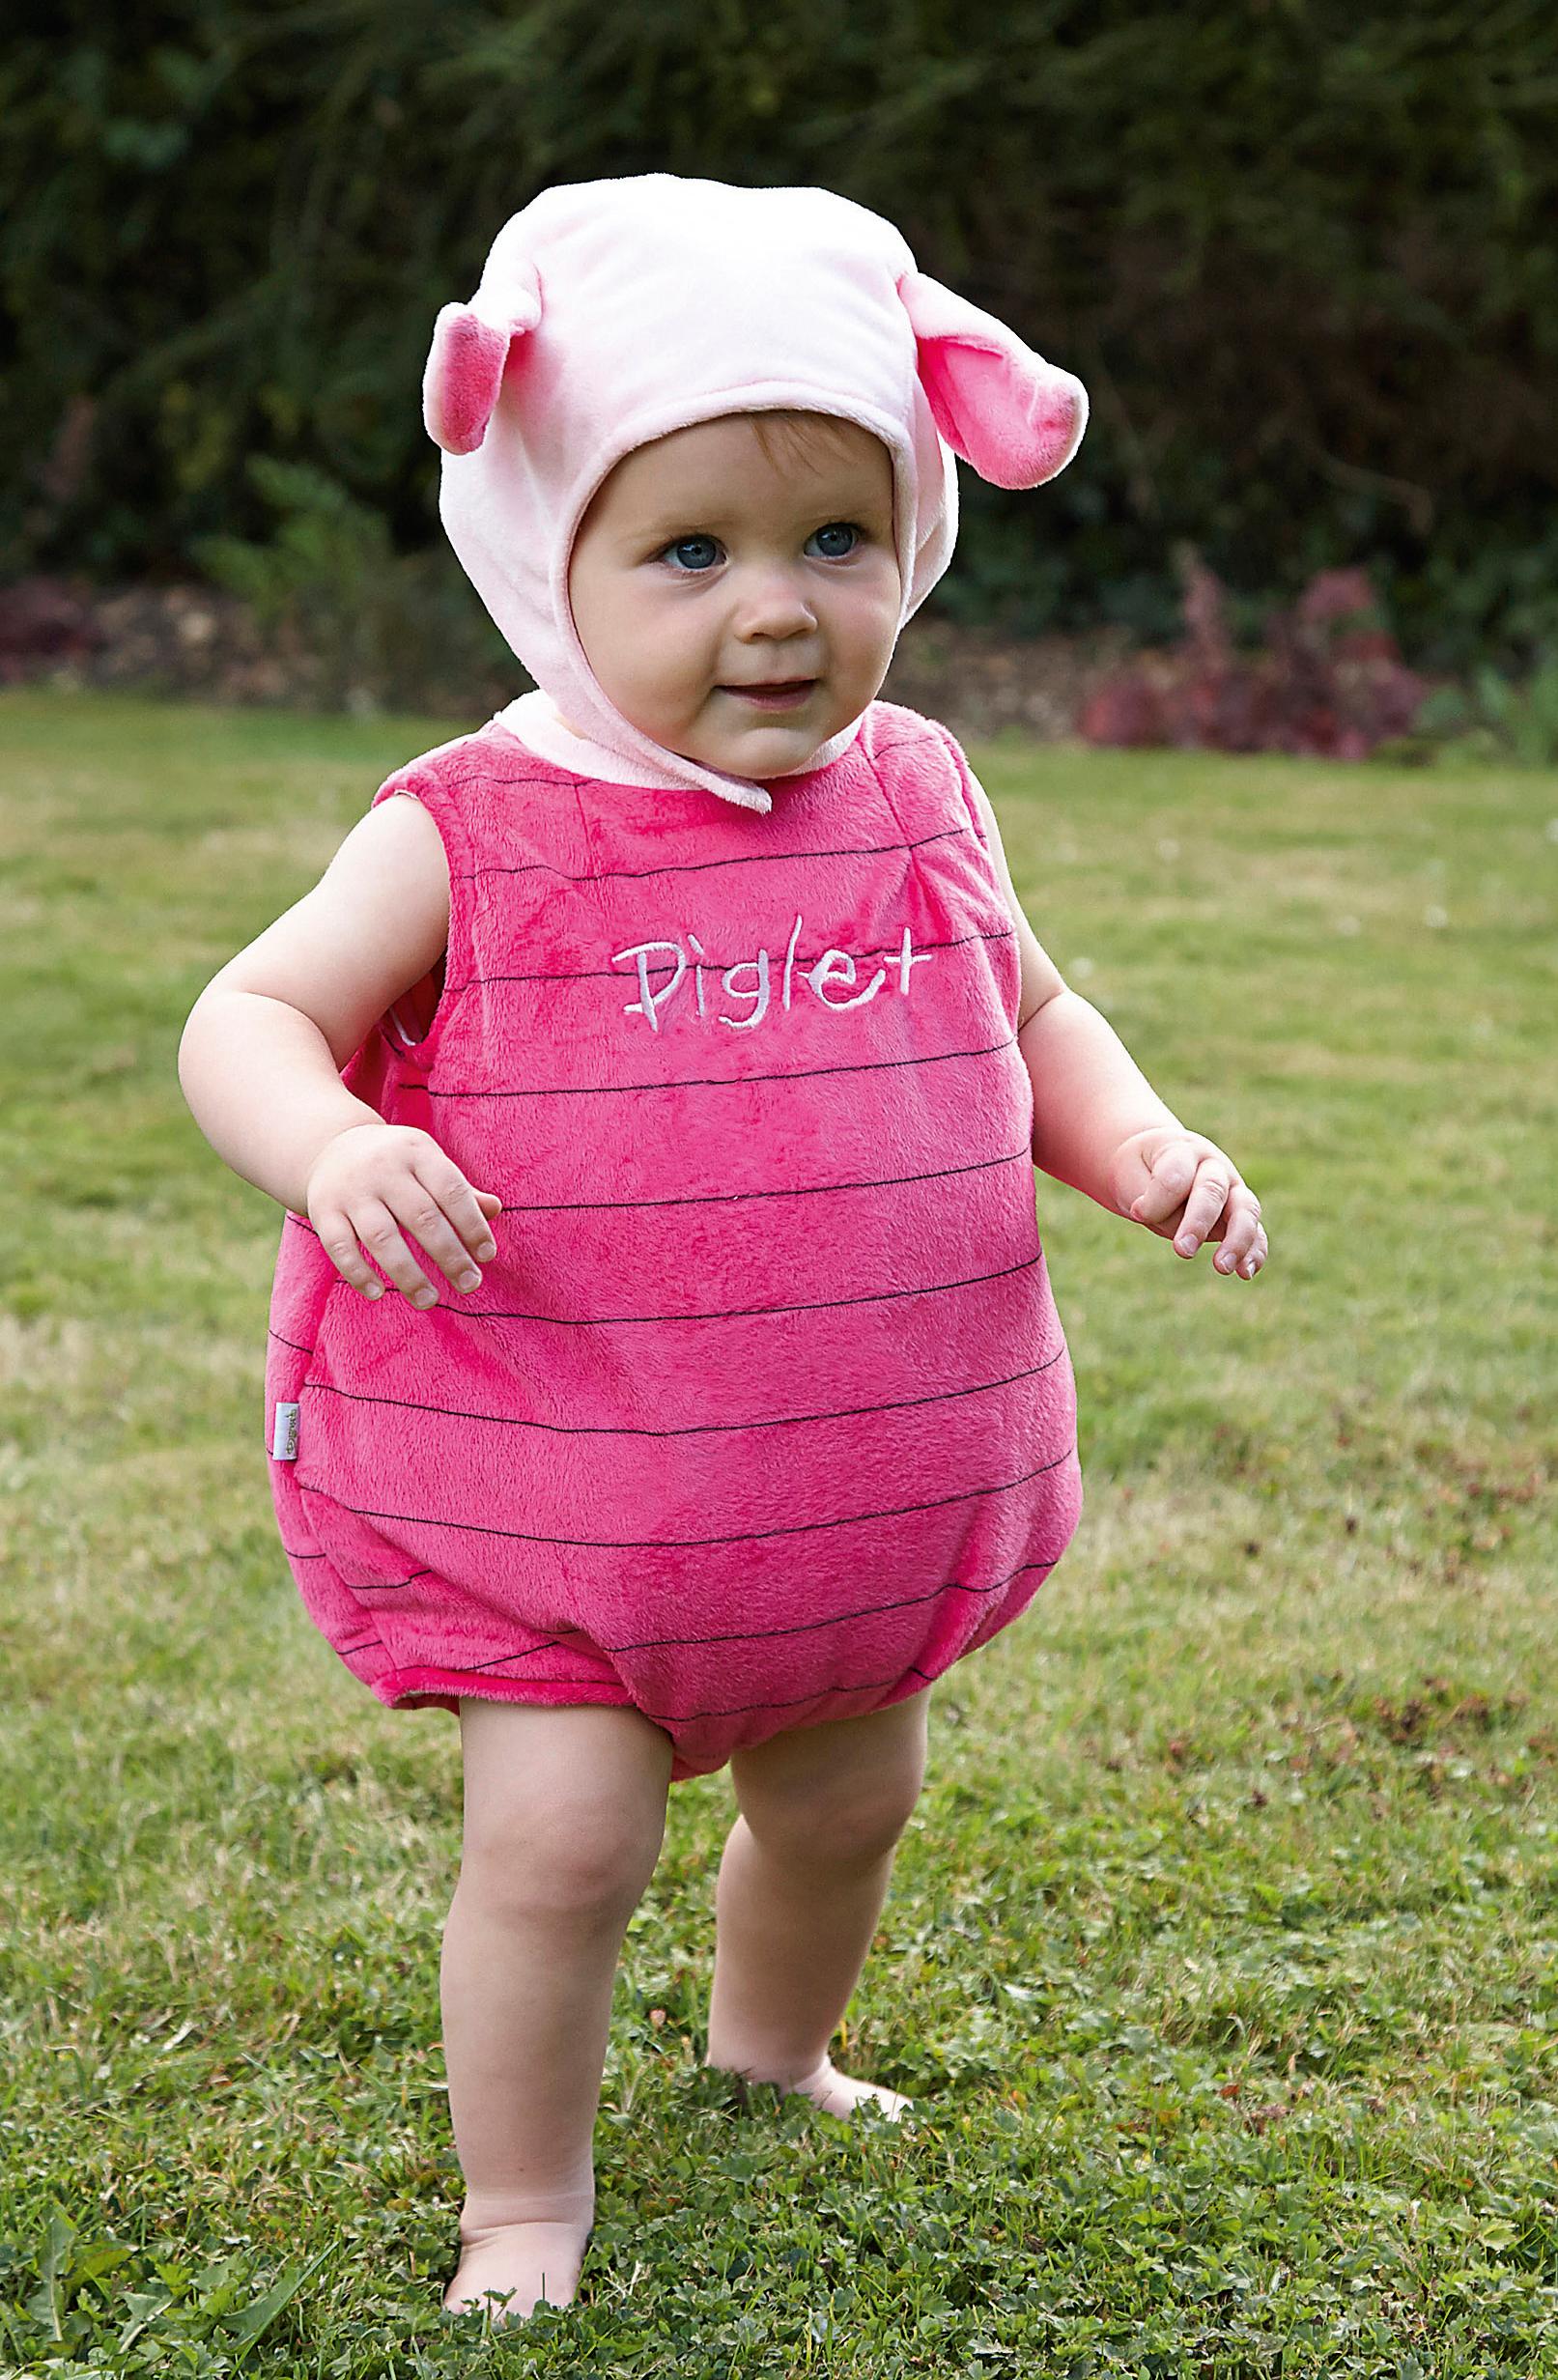 Disney Baby Winnie the Pooh Piglet Tabard Fancy Dress Costume